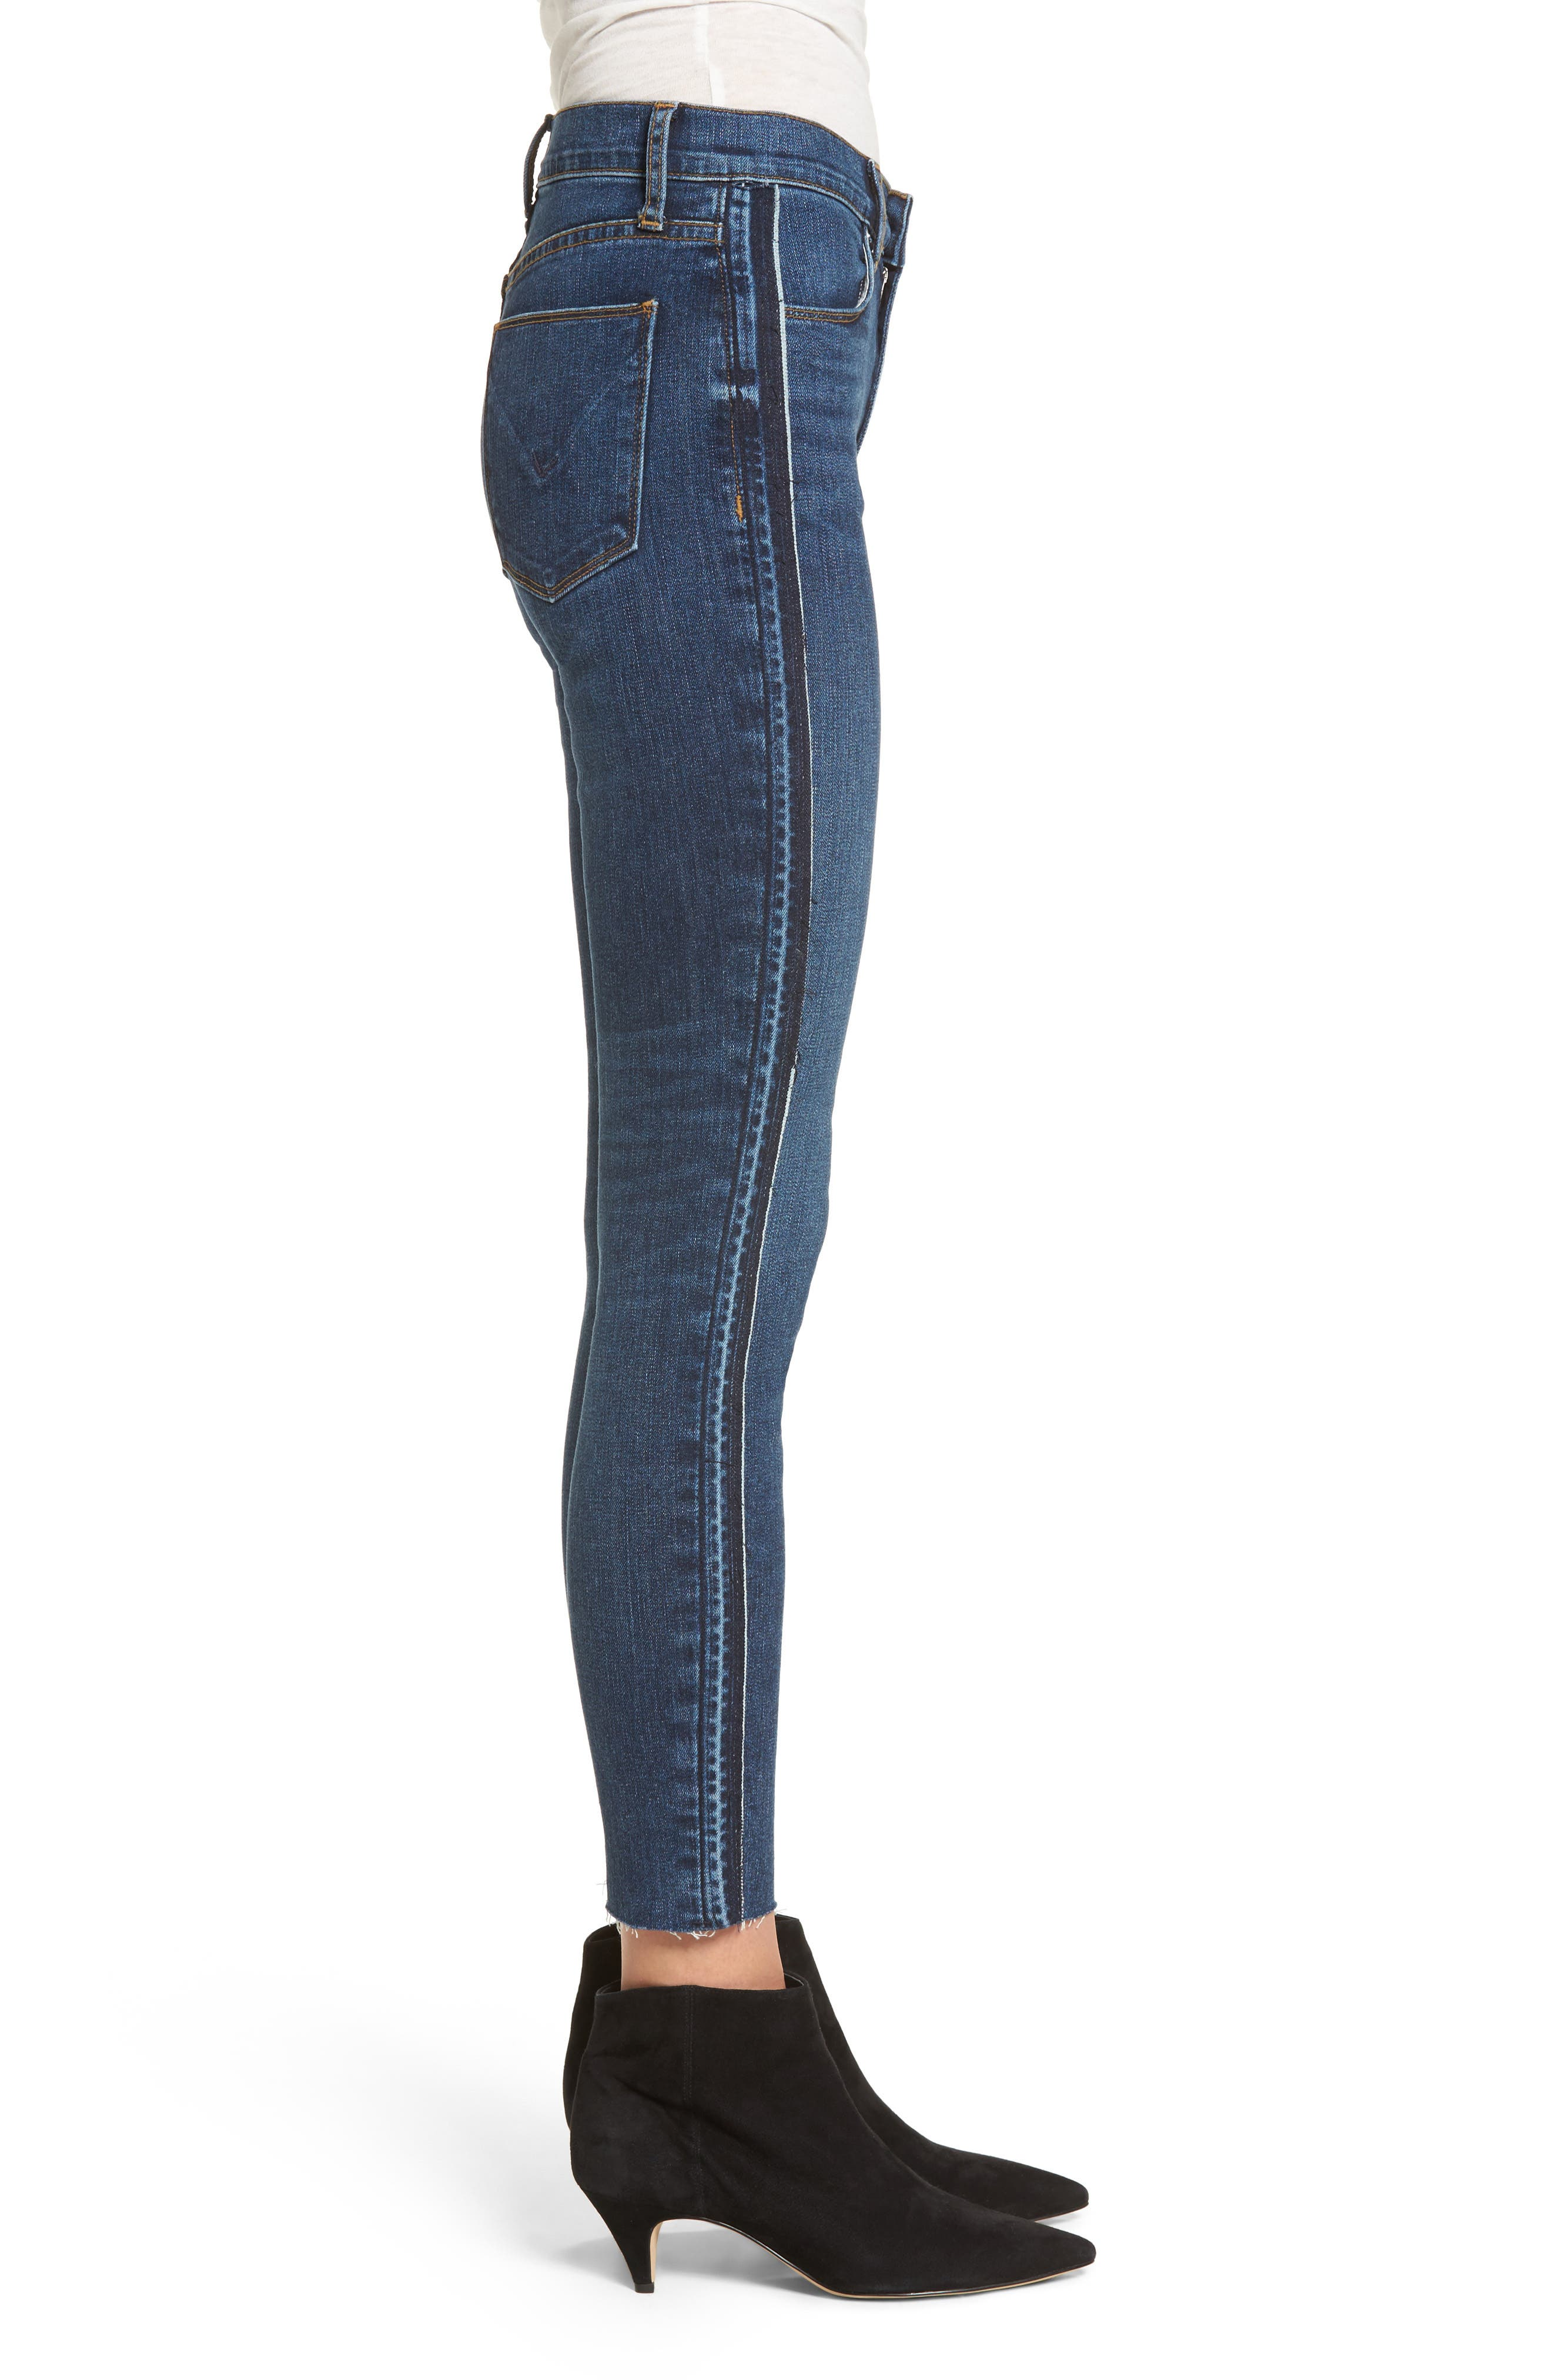 Barbara High Waist Super Skinny Jeans,                             Alternate thumbnail 3, color,                             400